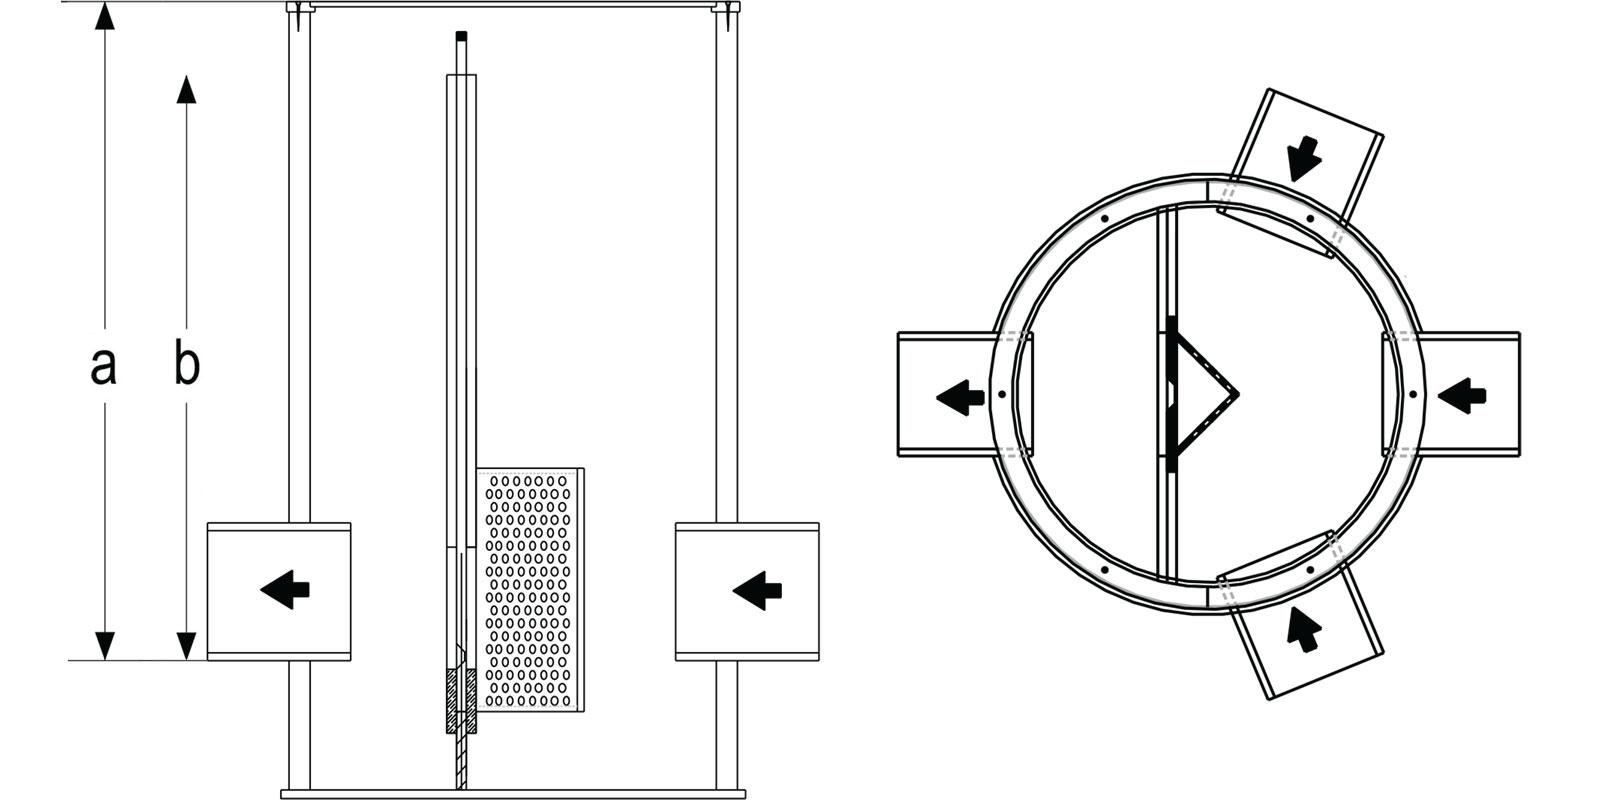 Controflow SUDS02005 dimensions